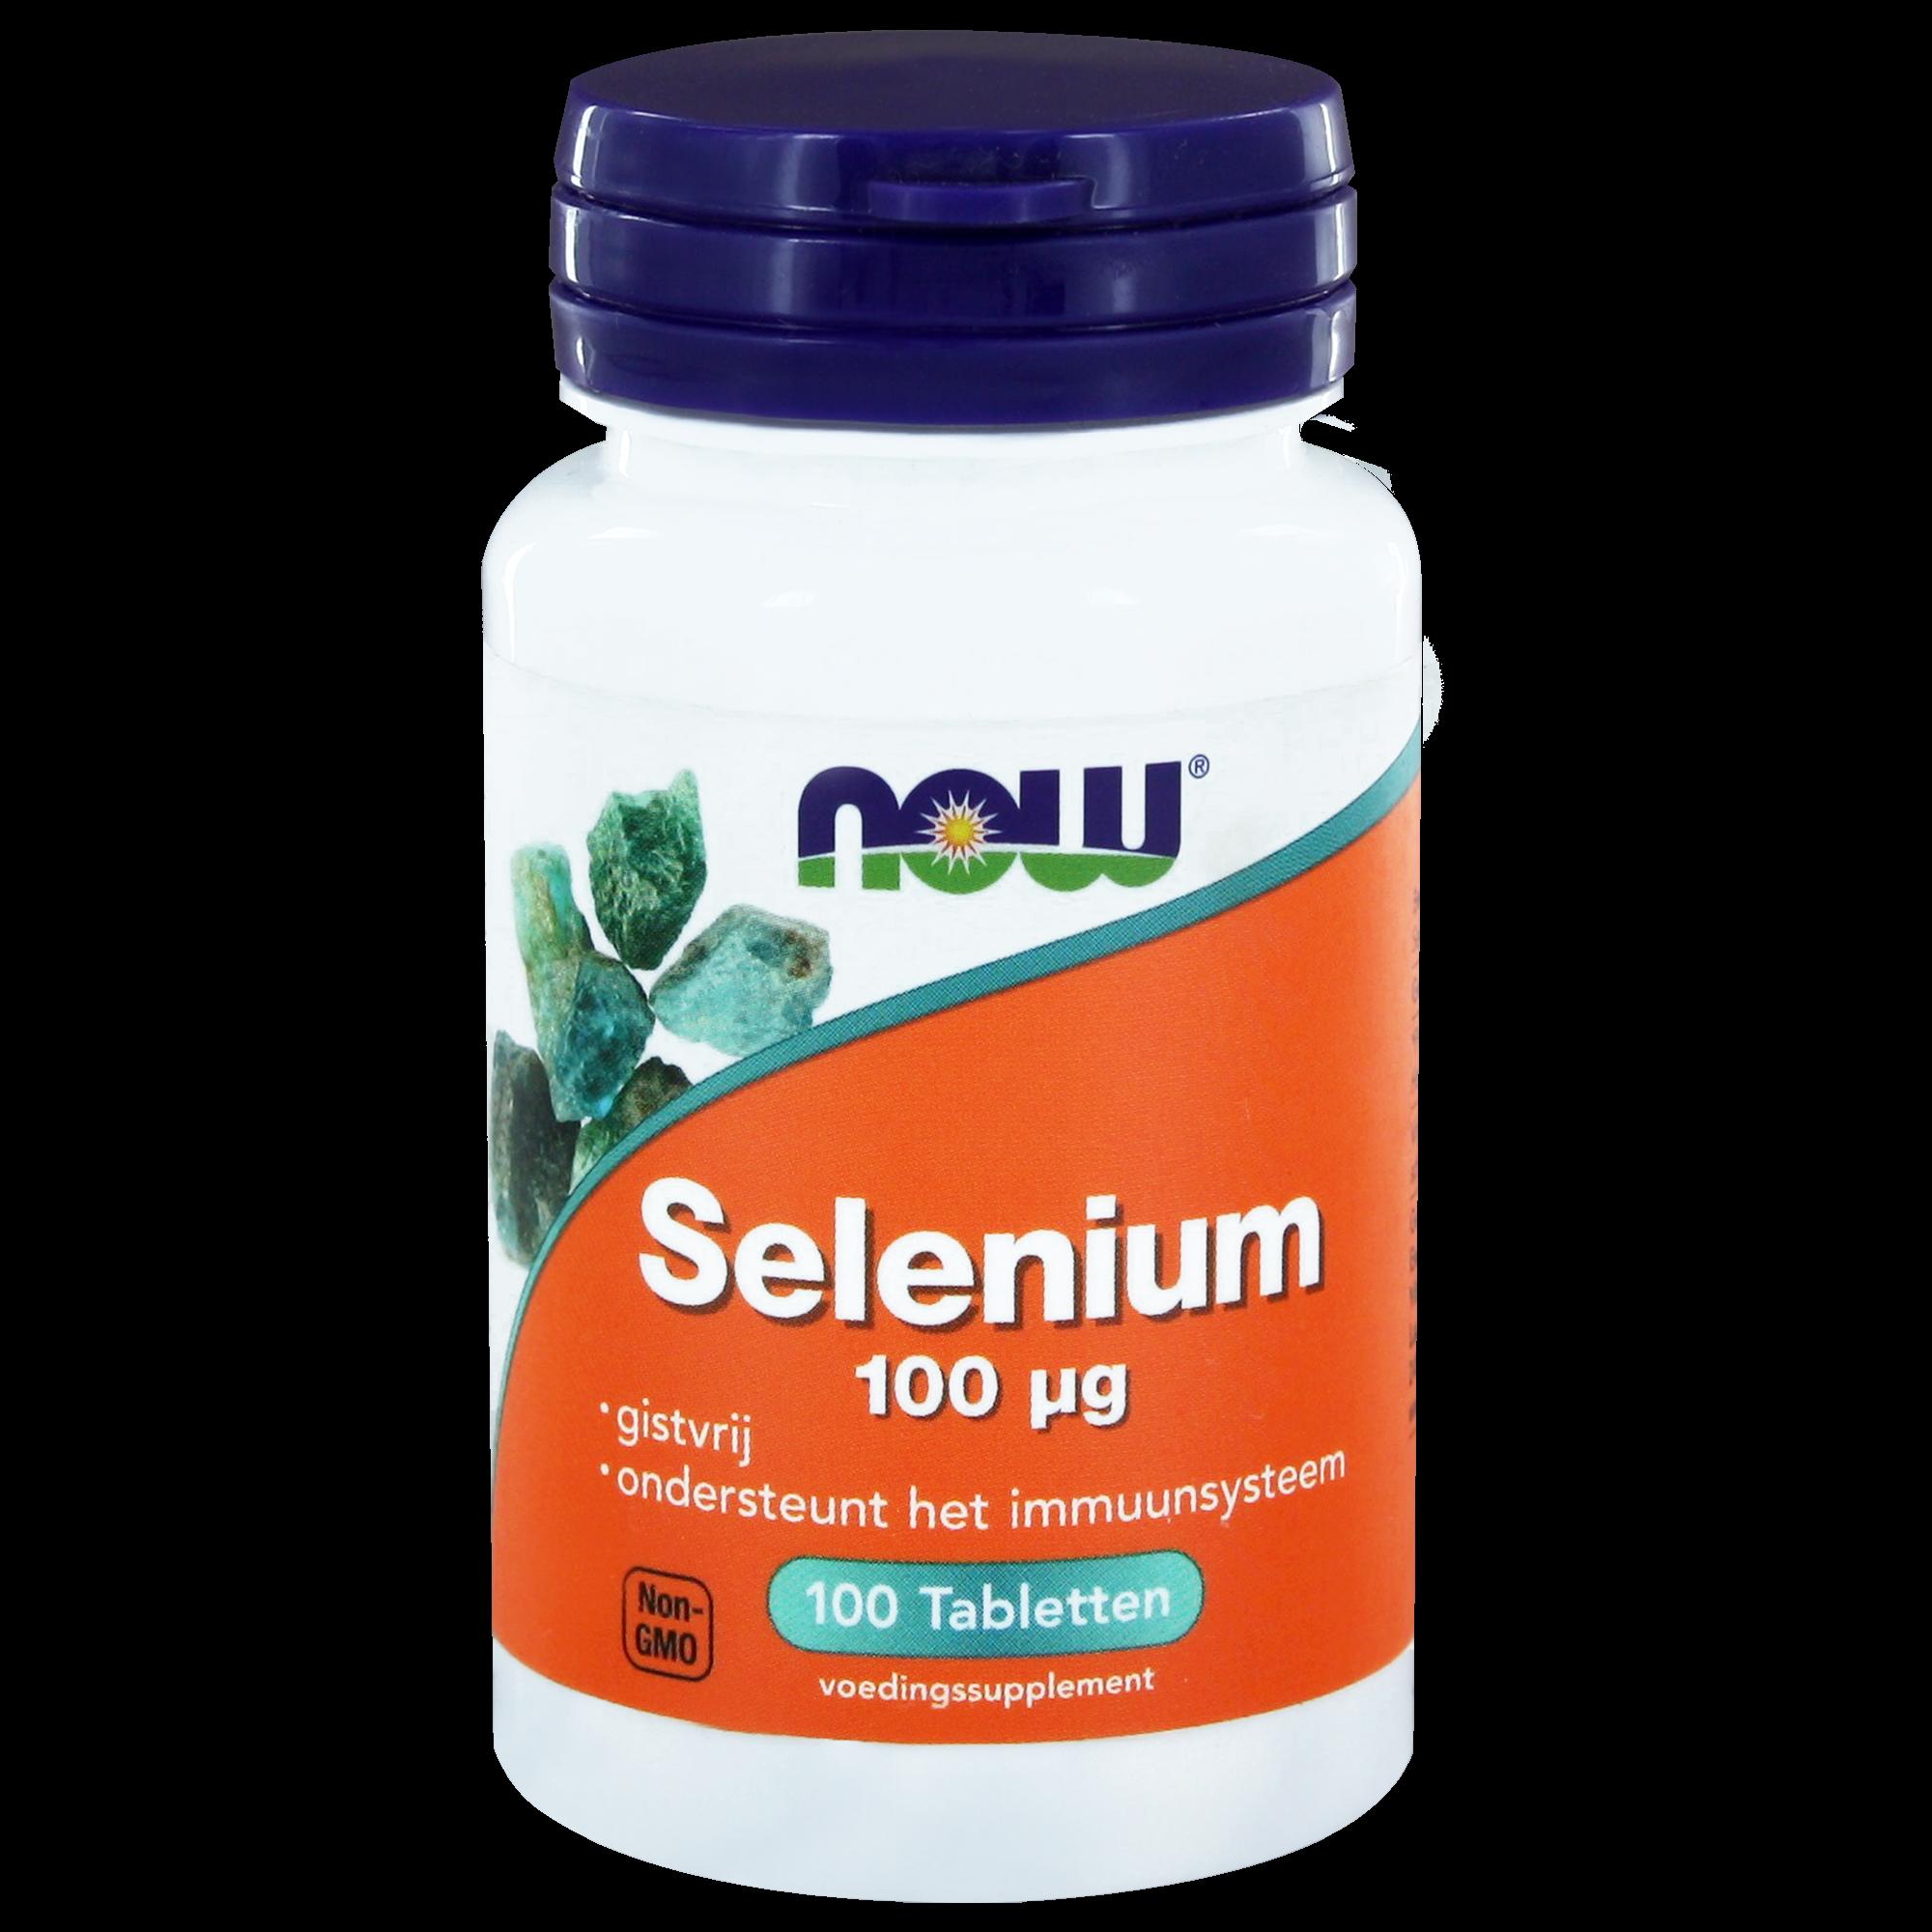 Selenium – 100 ug